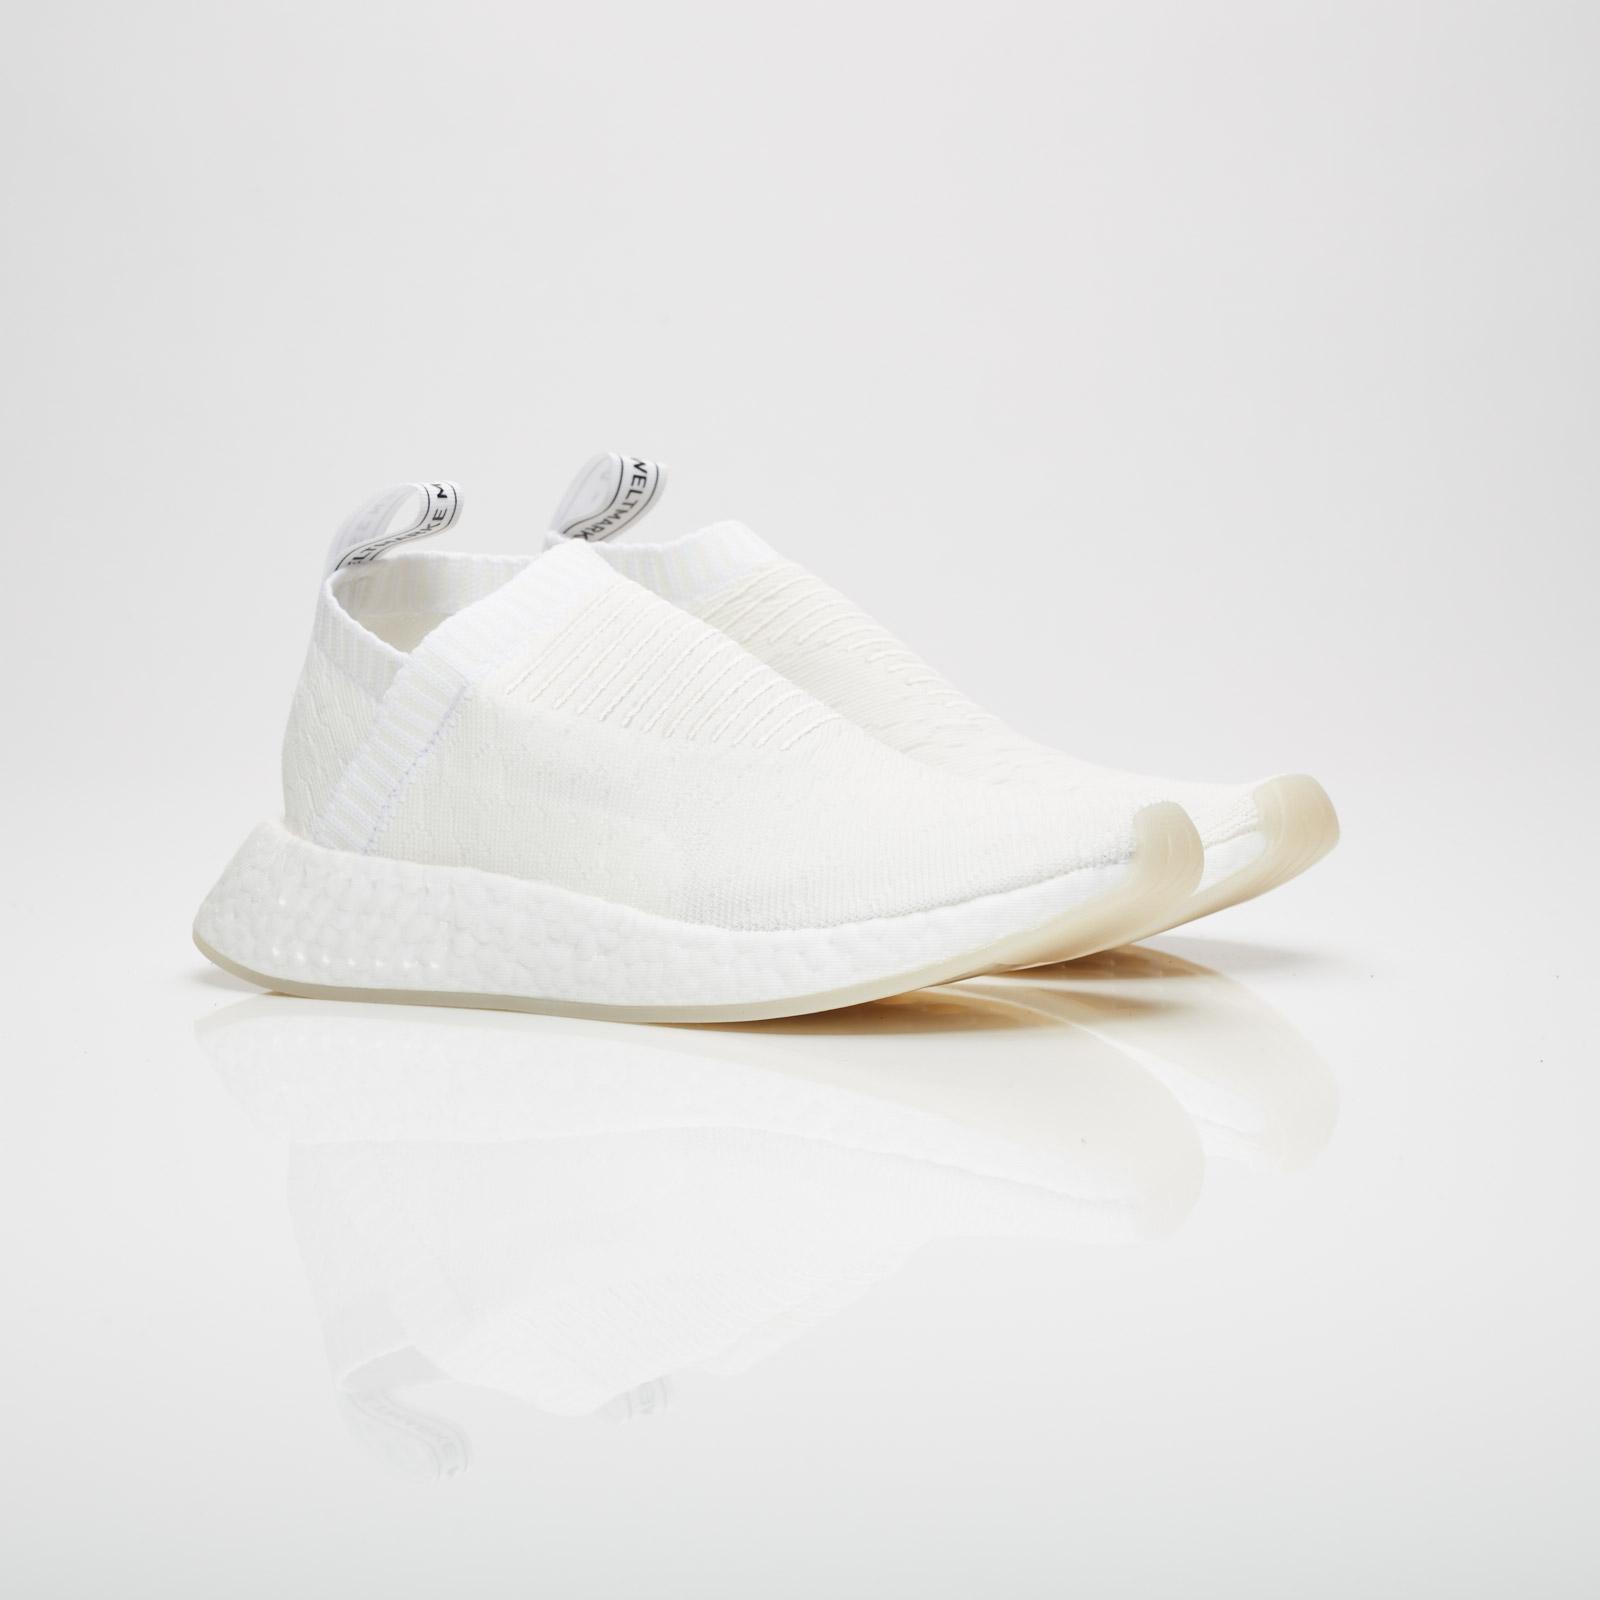 5a921f4e89cb4 adidas NMD CS2 PK W - By3018 - Sneakersnstuff